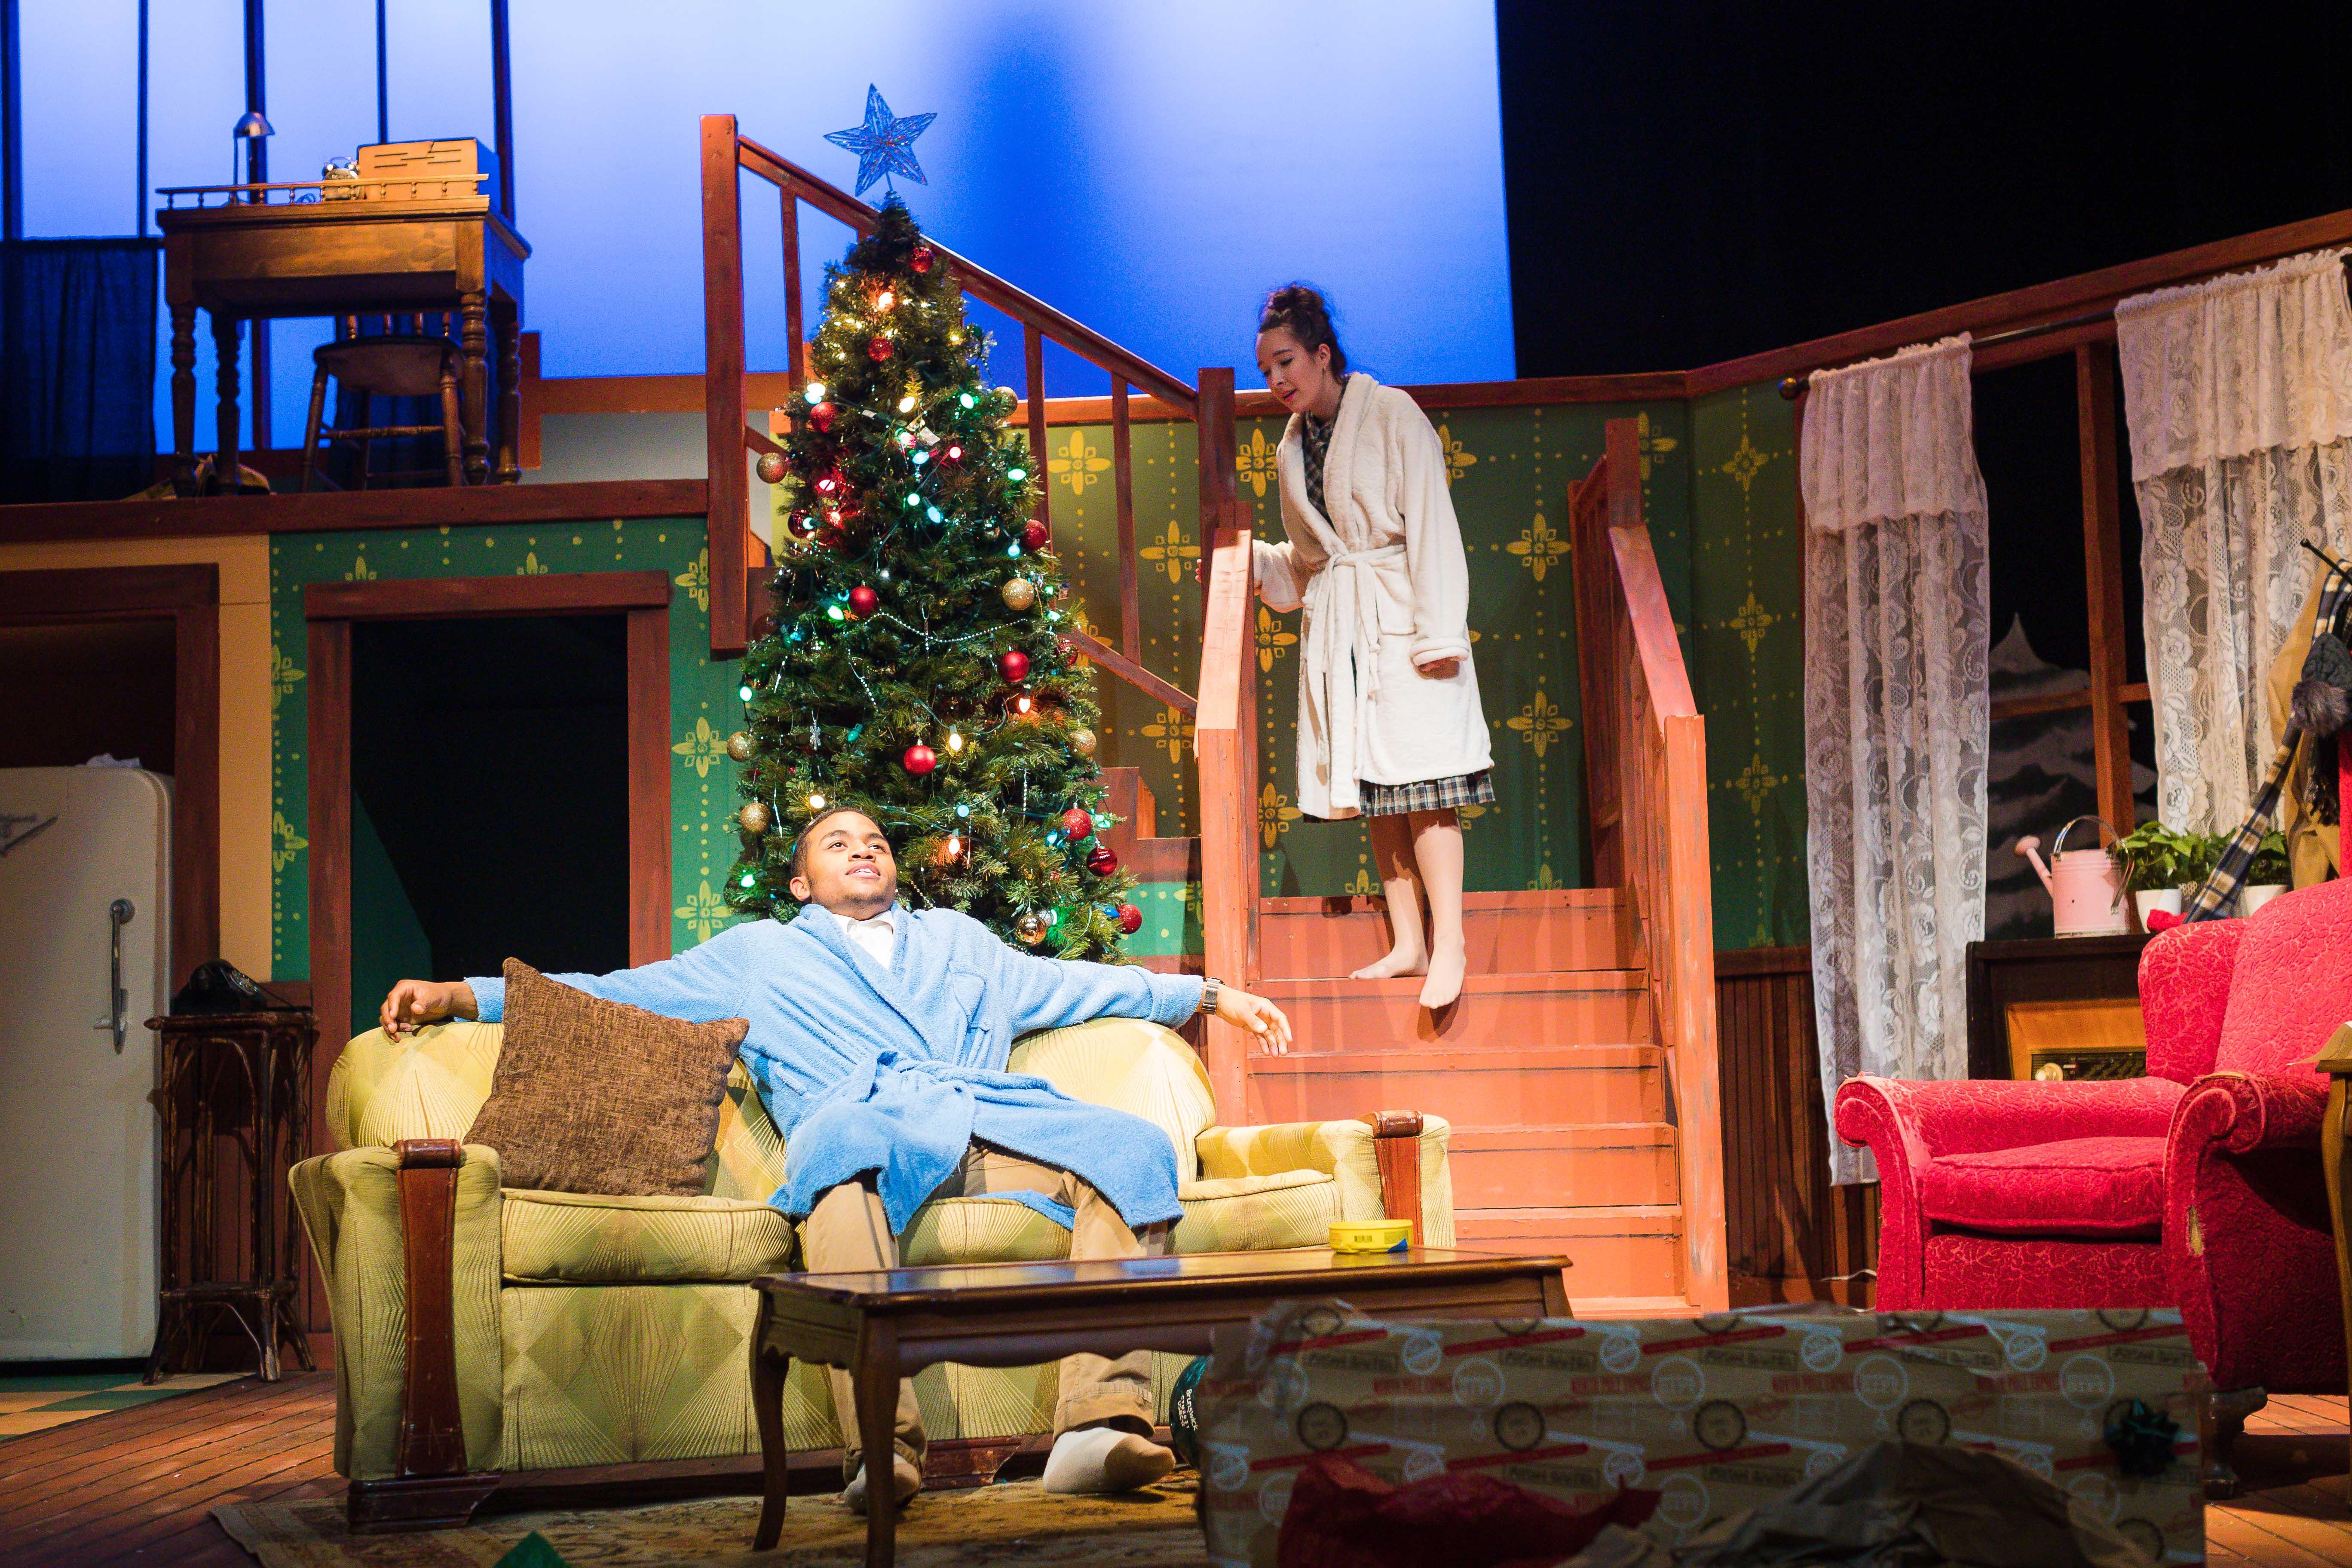 Weaver_Christmasshoot-_MG_1646